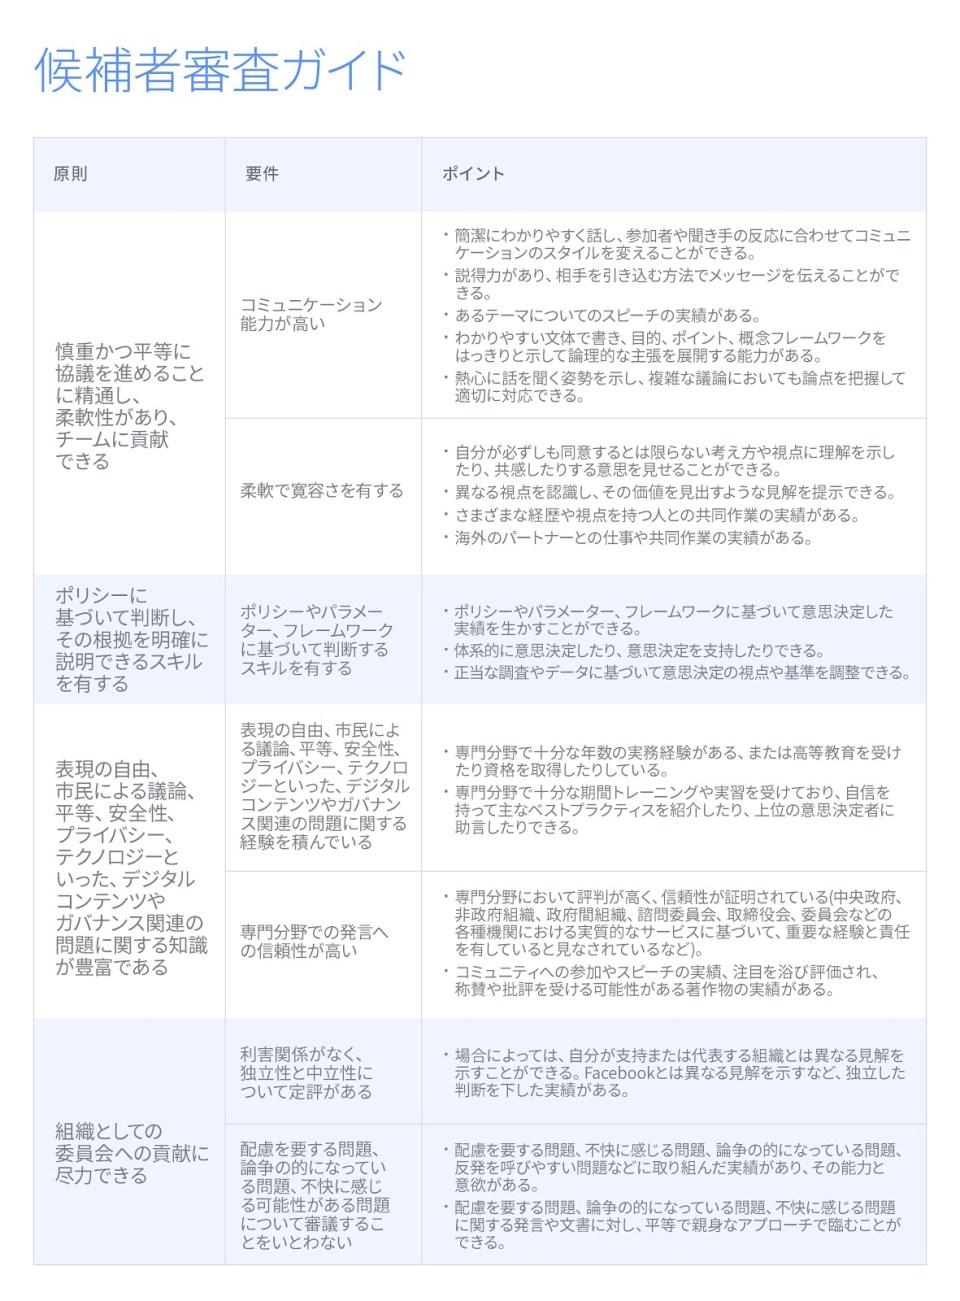 Candidate Review Guide_V5 copy_ONLINE_ja_JP